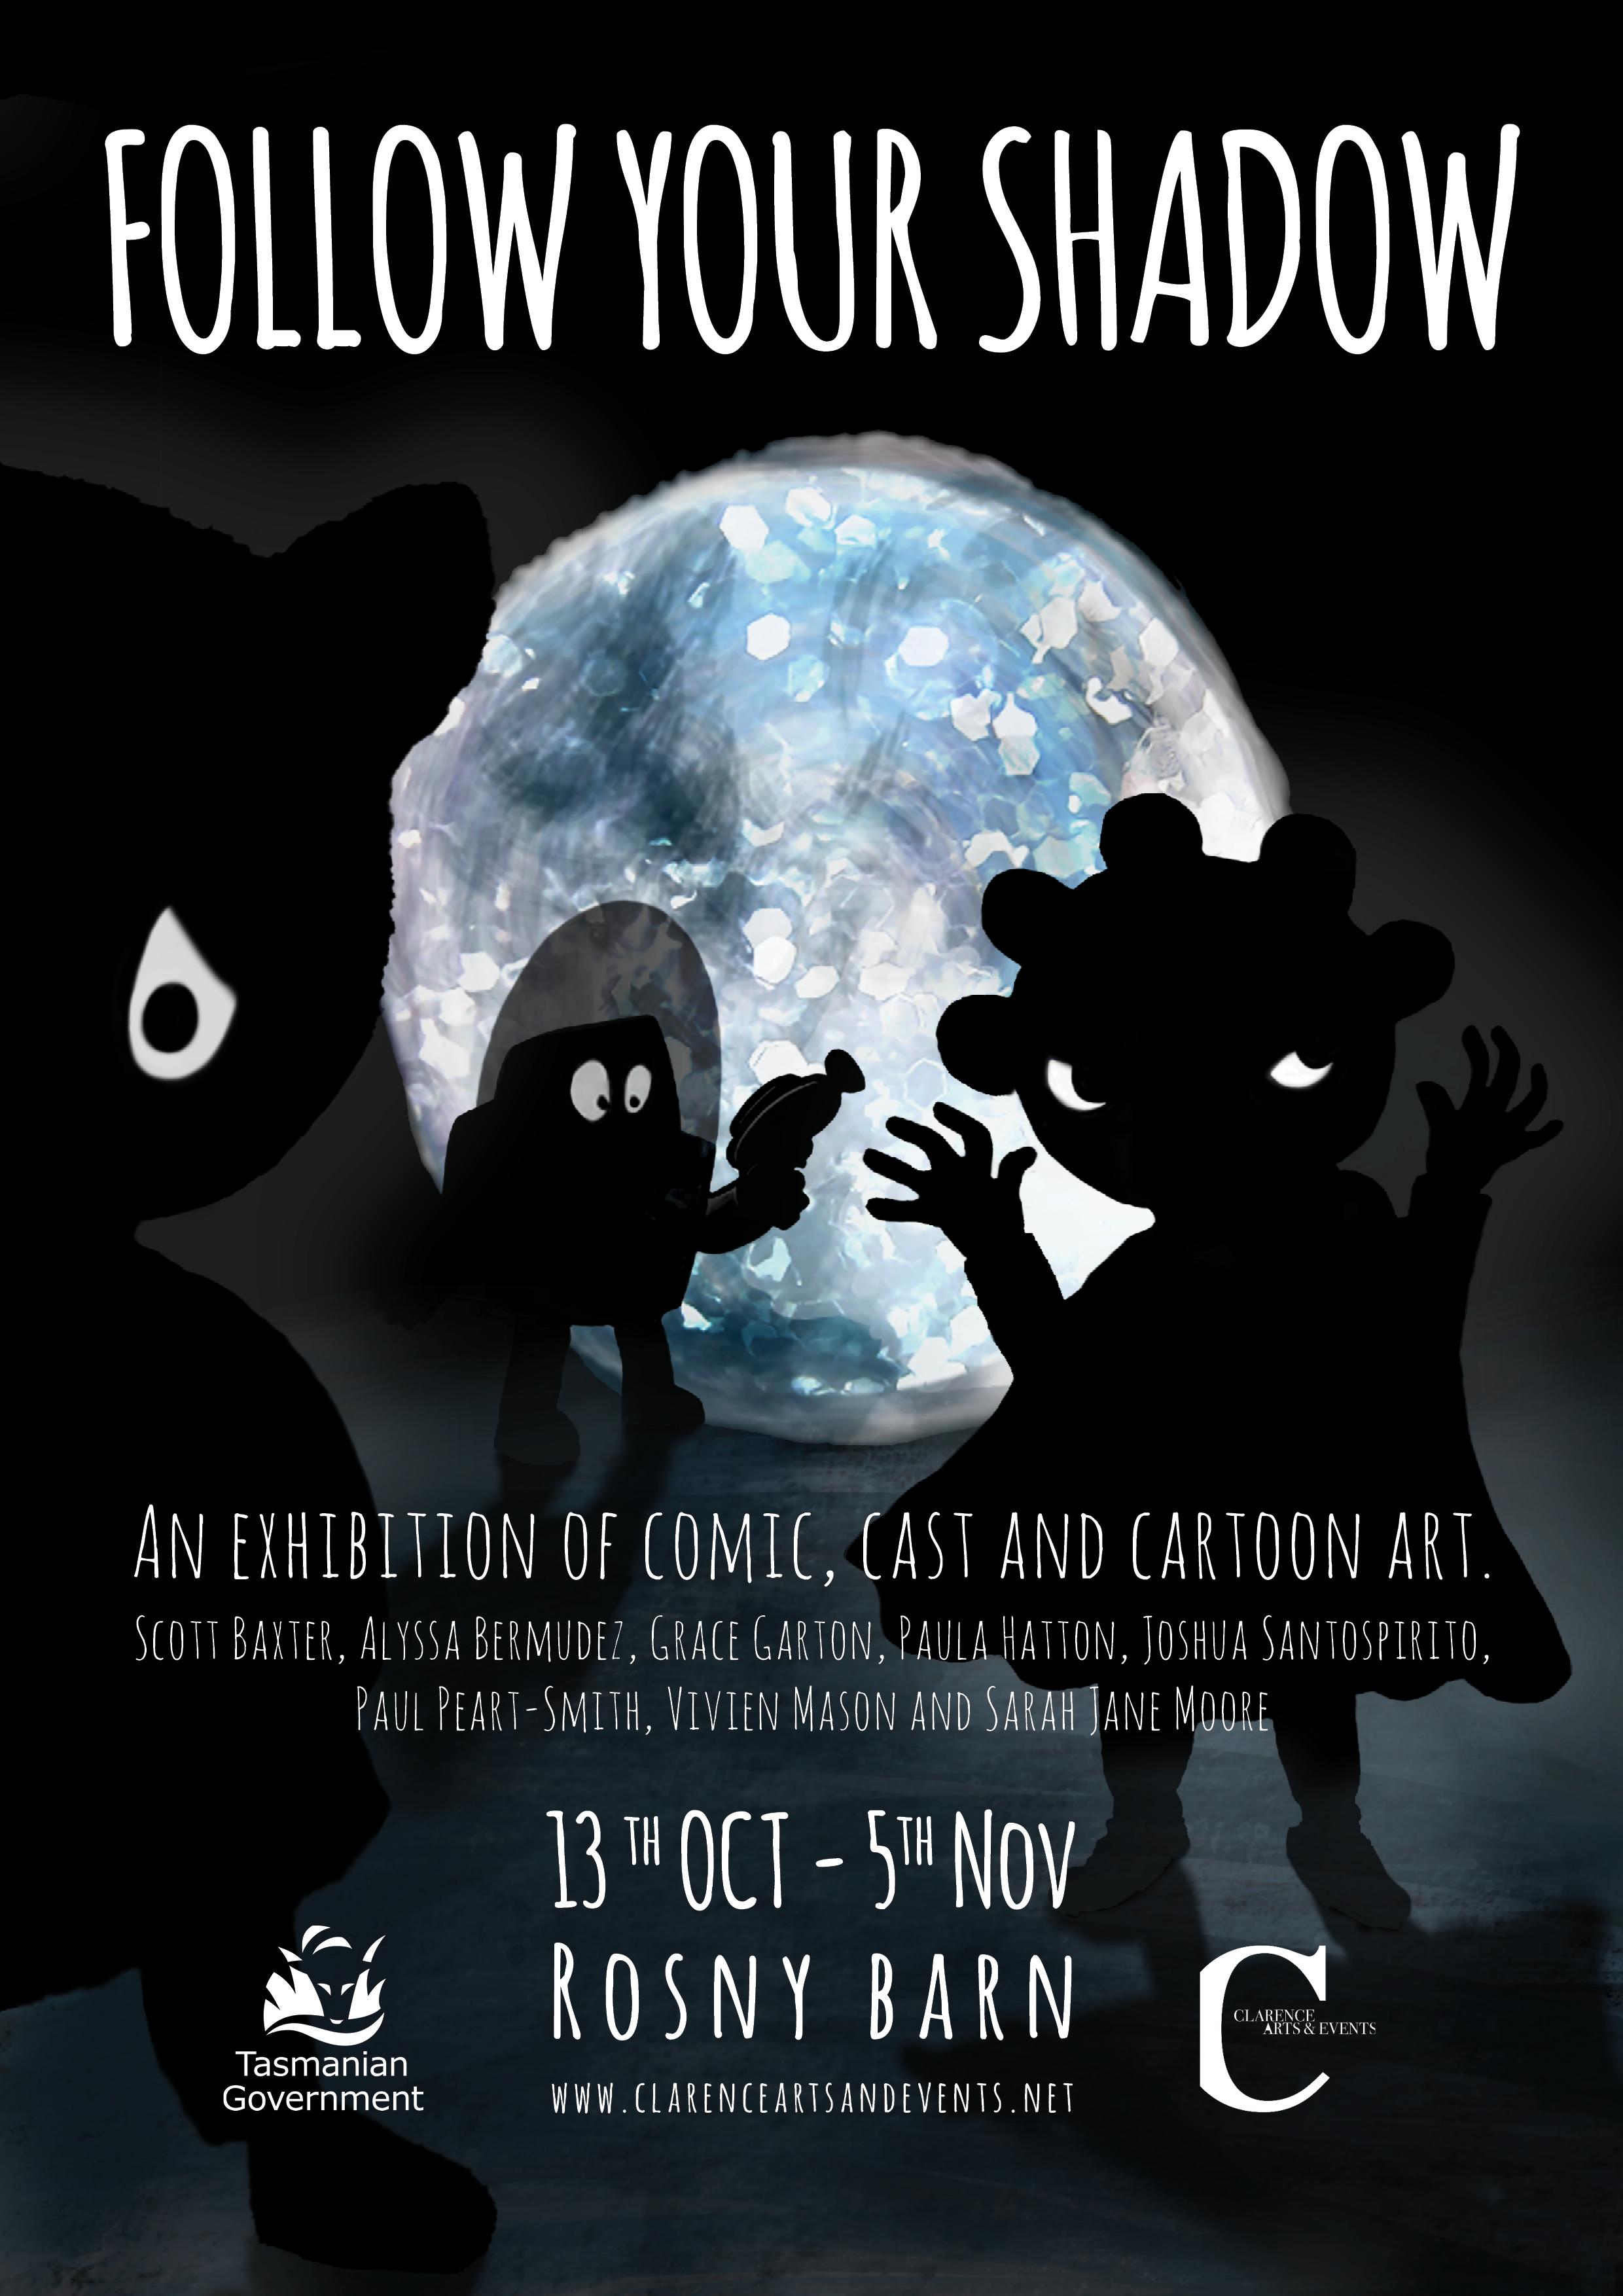 Follow Your Shadow_Exhibition_Rosny Barn_Vivien Mason